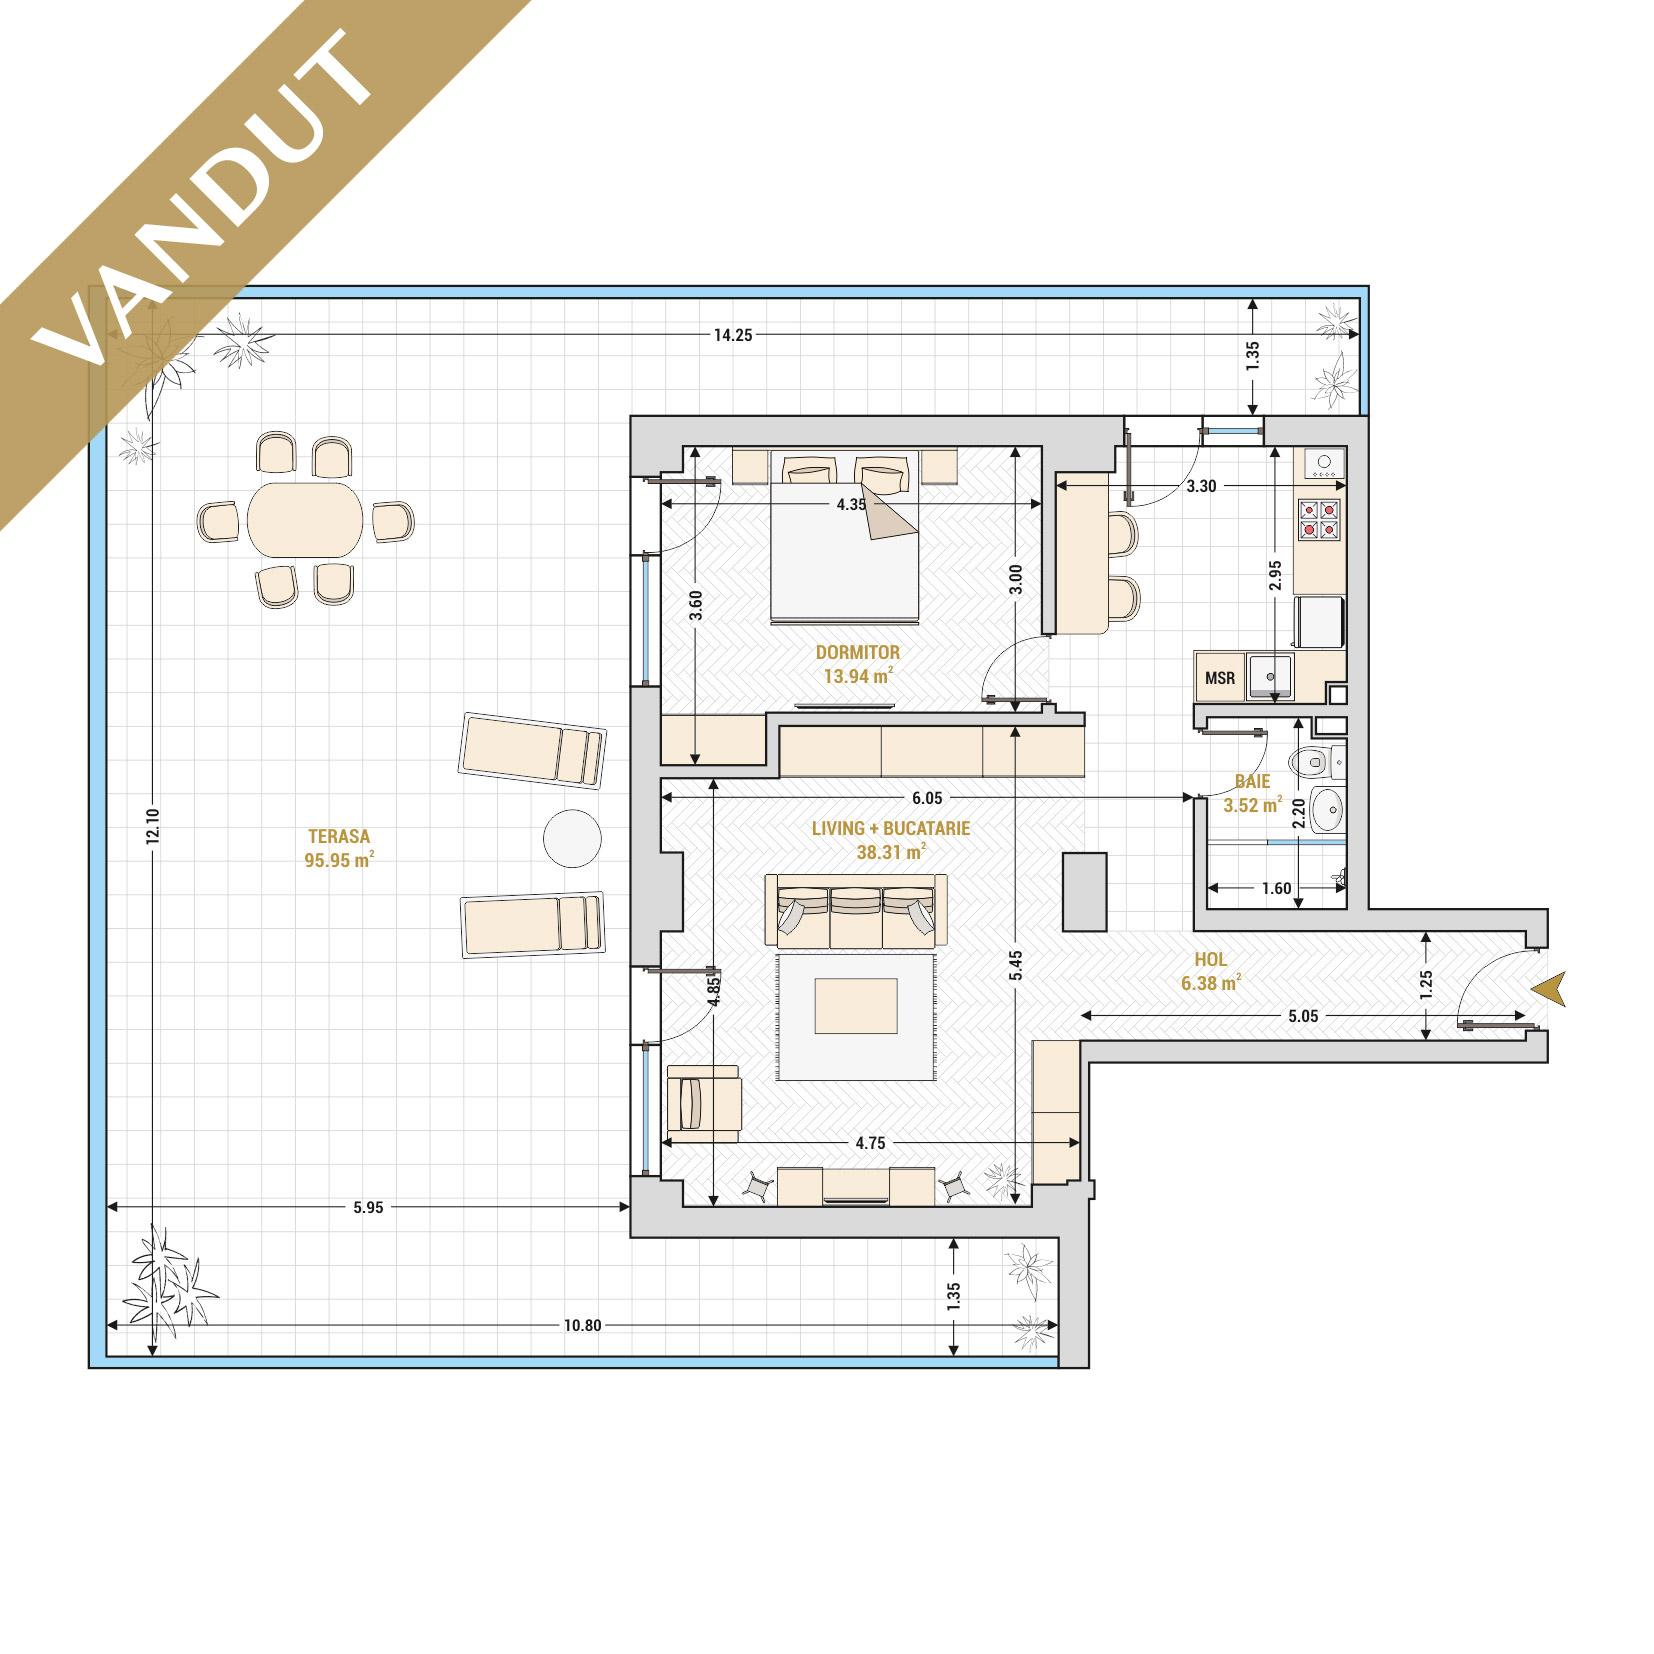 Apartamente cu 2 camere de vanzare Bucuresti - Catedral Residence - Marriott, Piata Unirii, 13 Septembrie, Izvor - Tip 10 - T1A - V